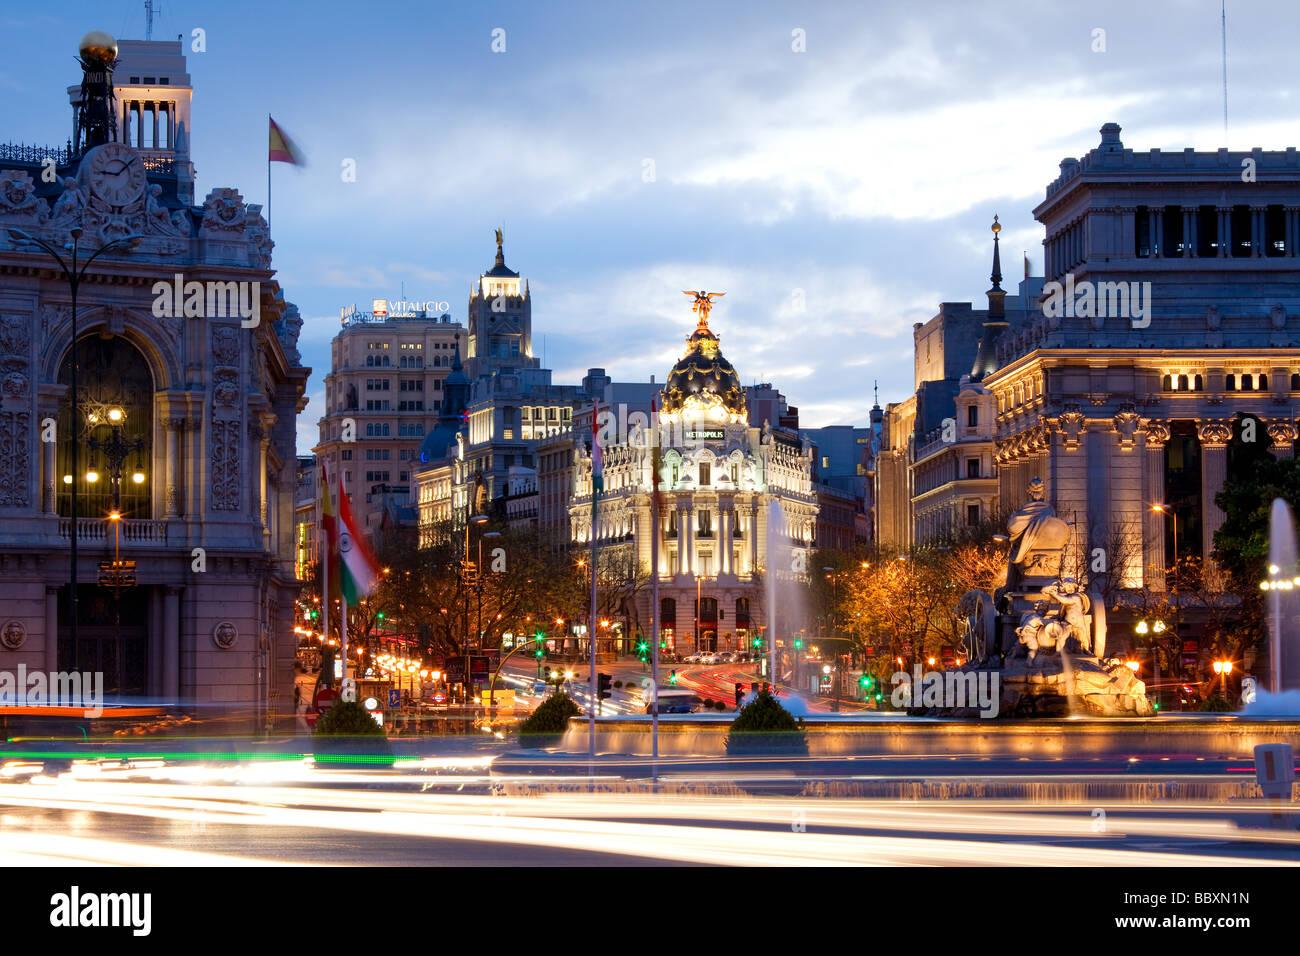 View over Plaza de Cibeles towards the Gran Via Madid Spain - Stock Image